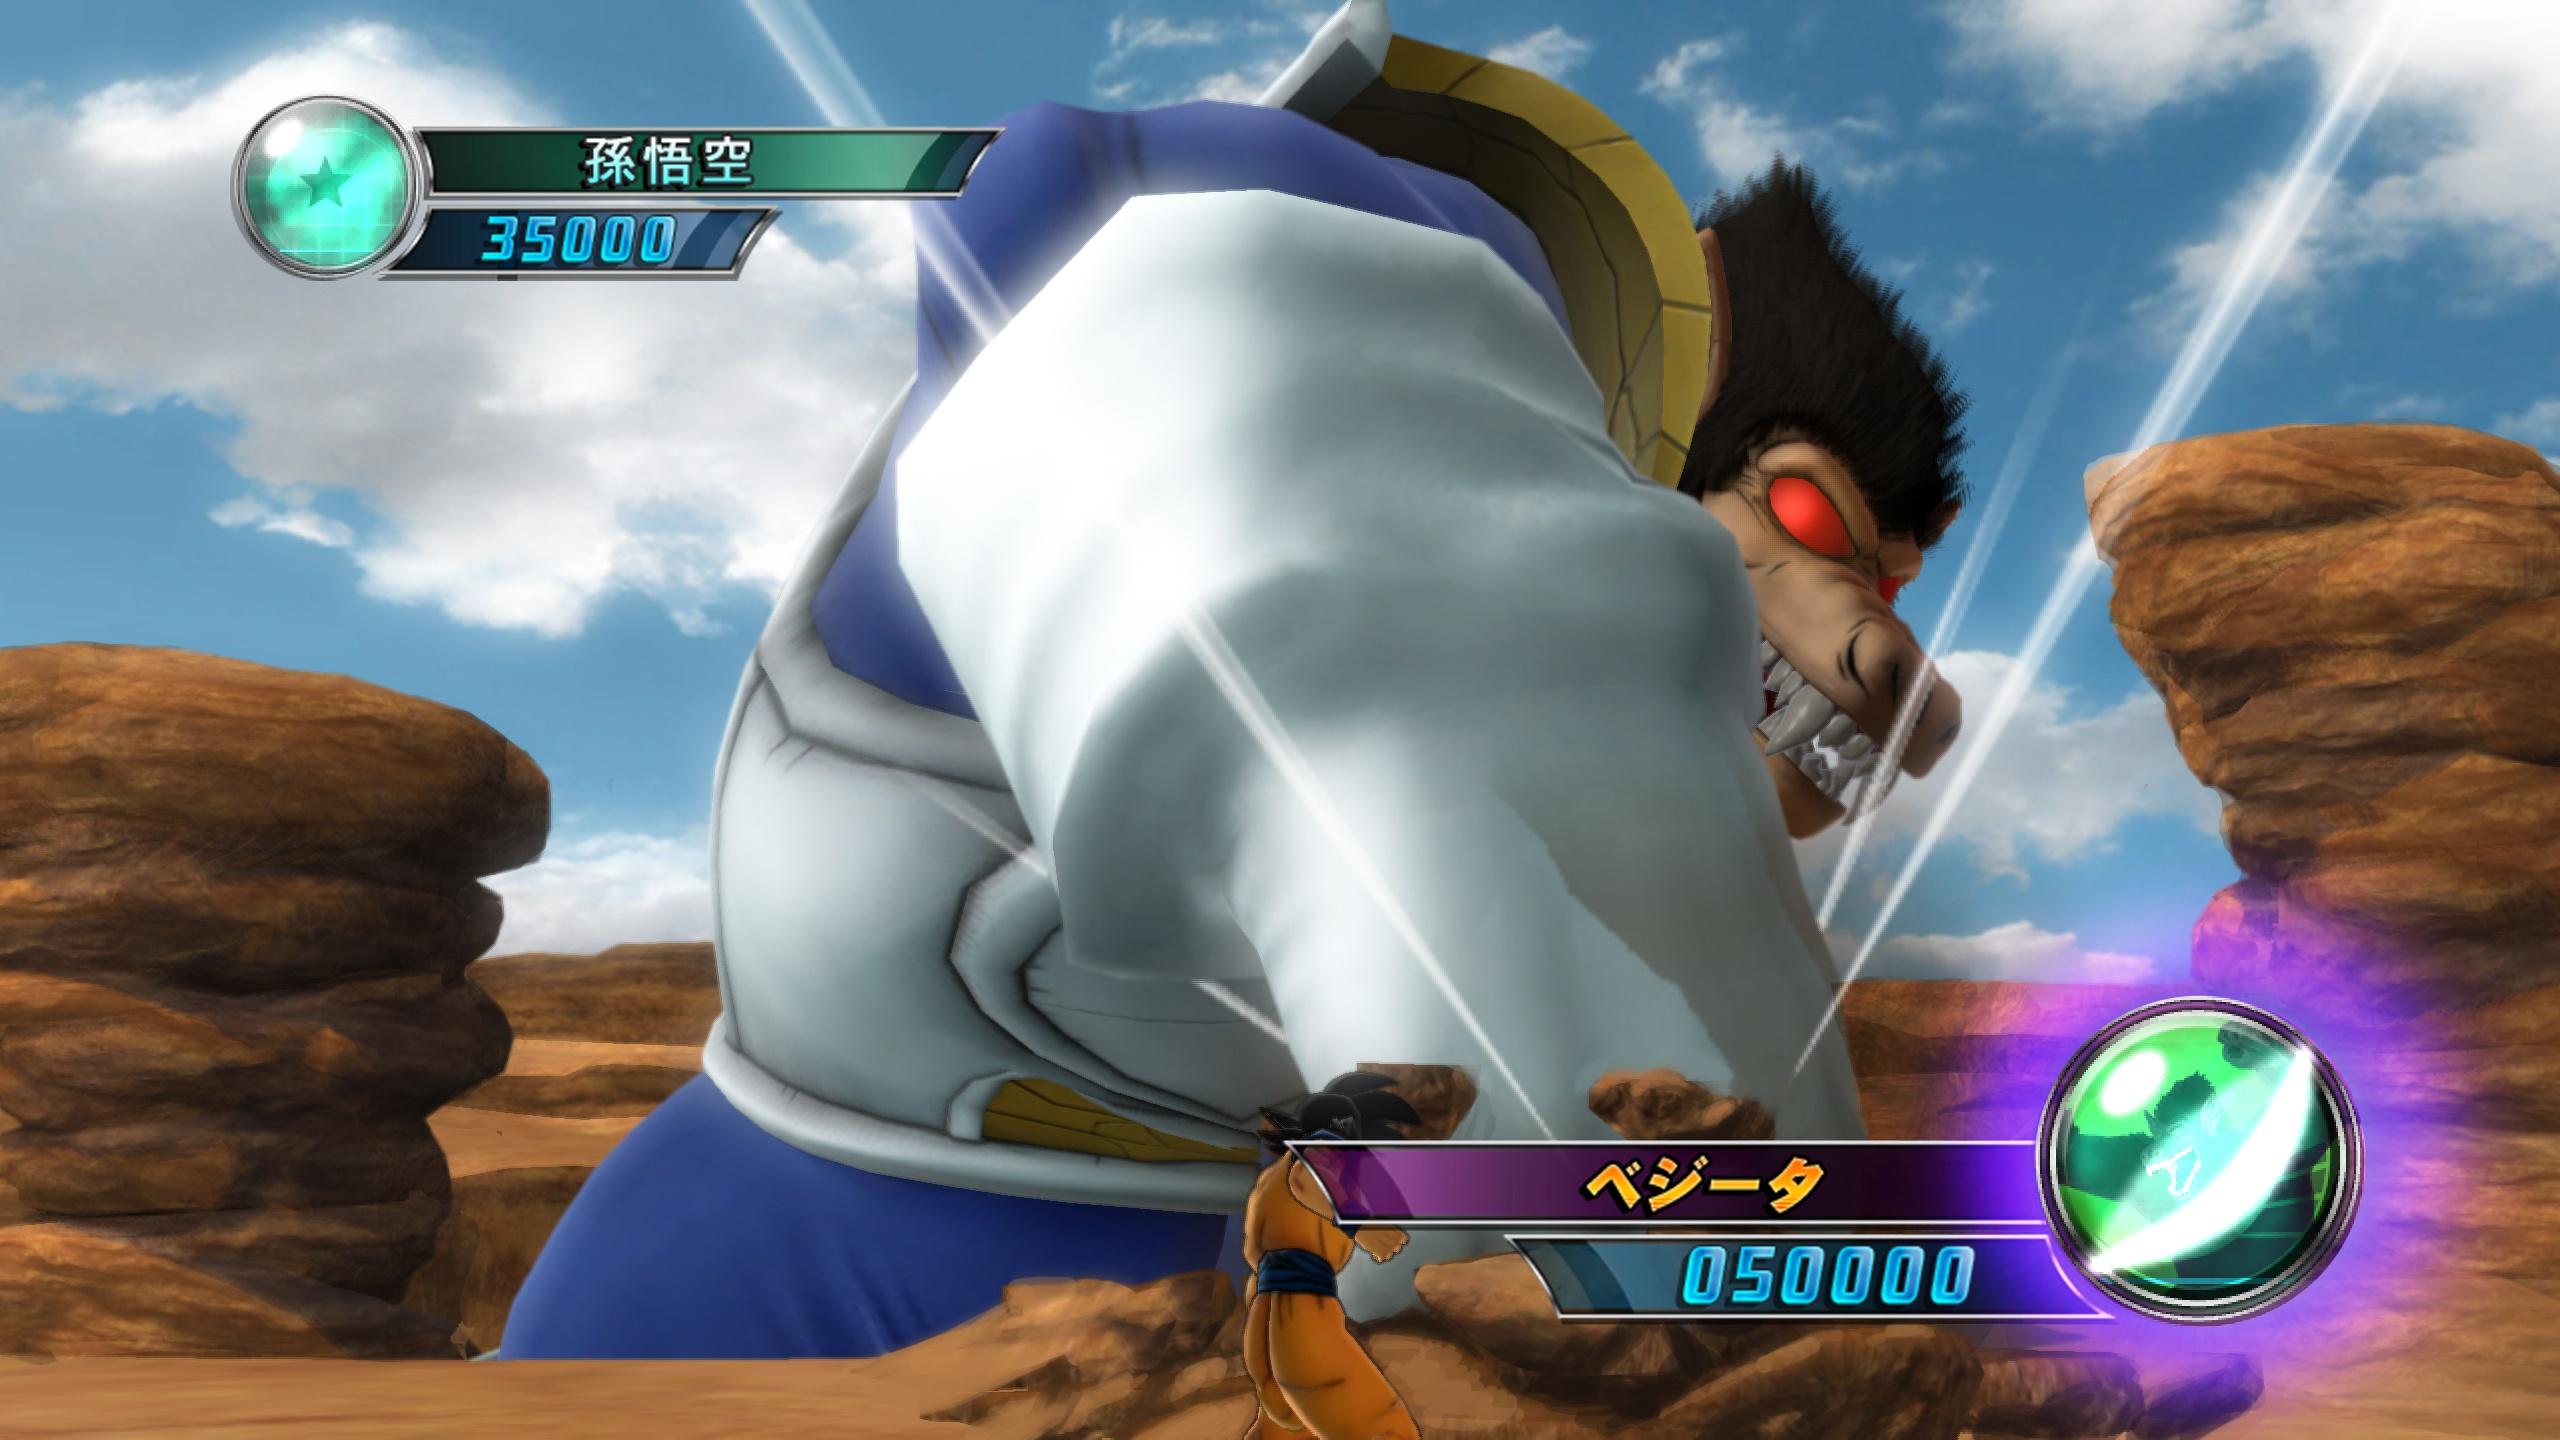 Dragon-Ball-Z-Ultimate-Tenkaichi_2011_06-30-11_003